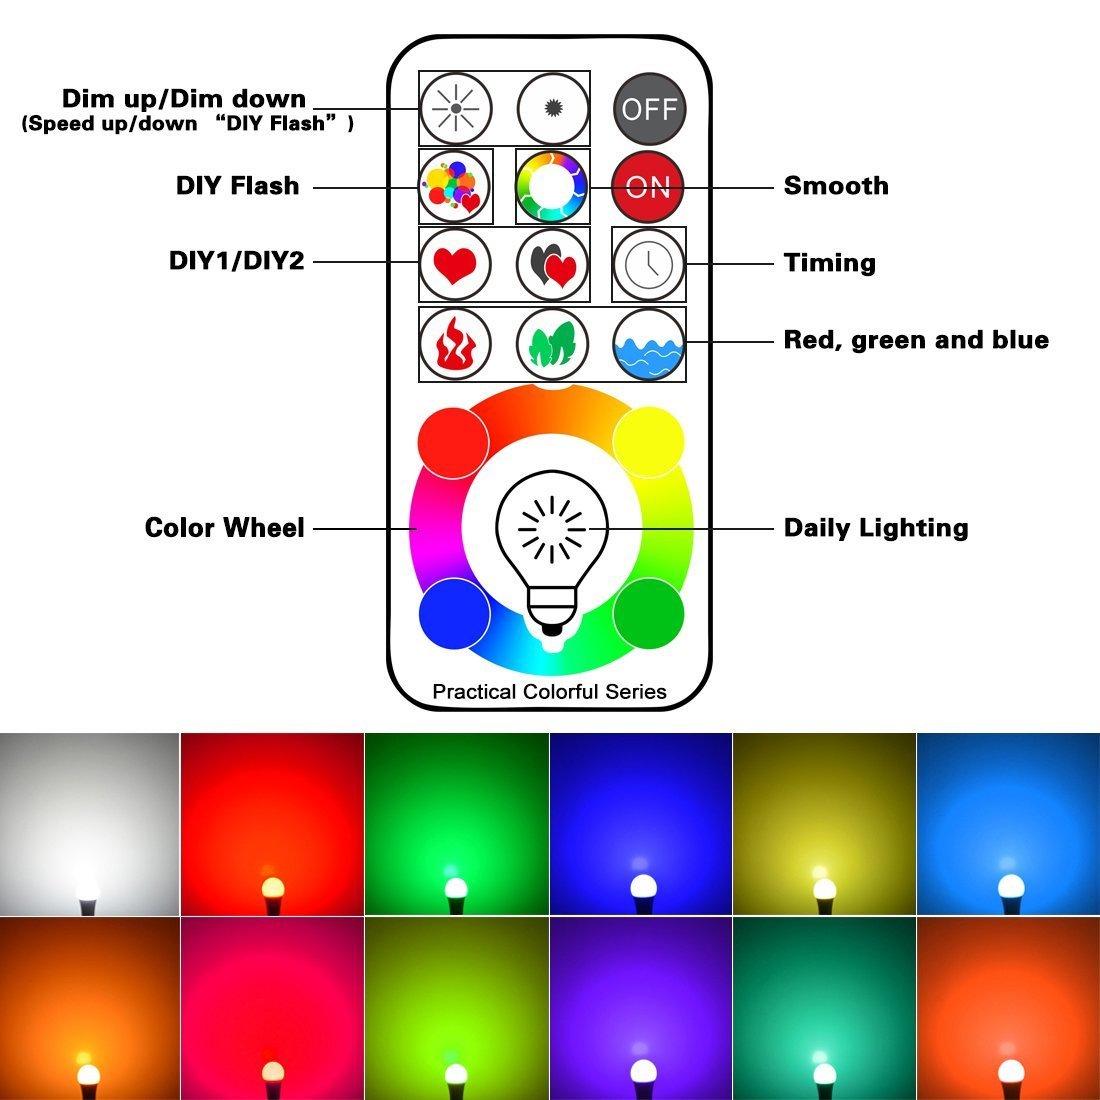 120 Farben RGBW iLC LED Farbige Leuchtmittel RGB+Wei/ß Lampe Dimmbare Farbige Leuchtmitte Farbwechsel Lampen Scheinwerfer 10 Watt B22